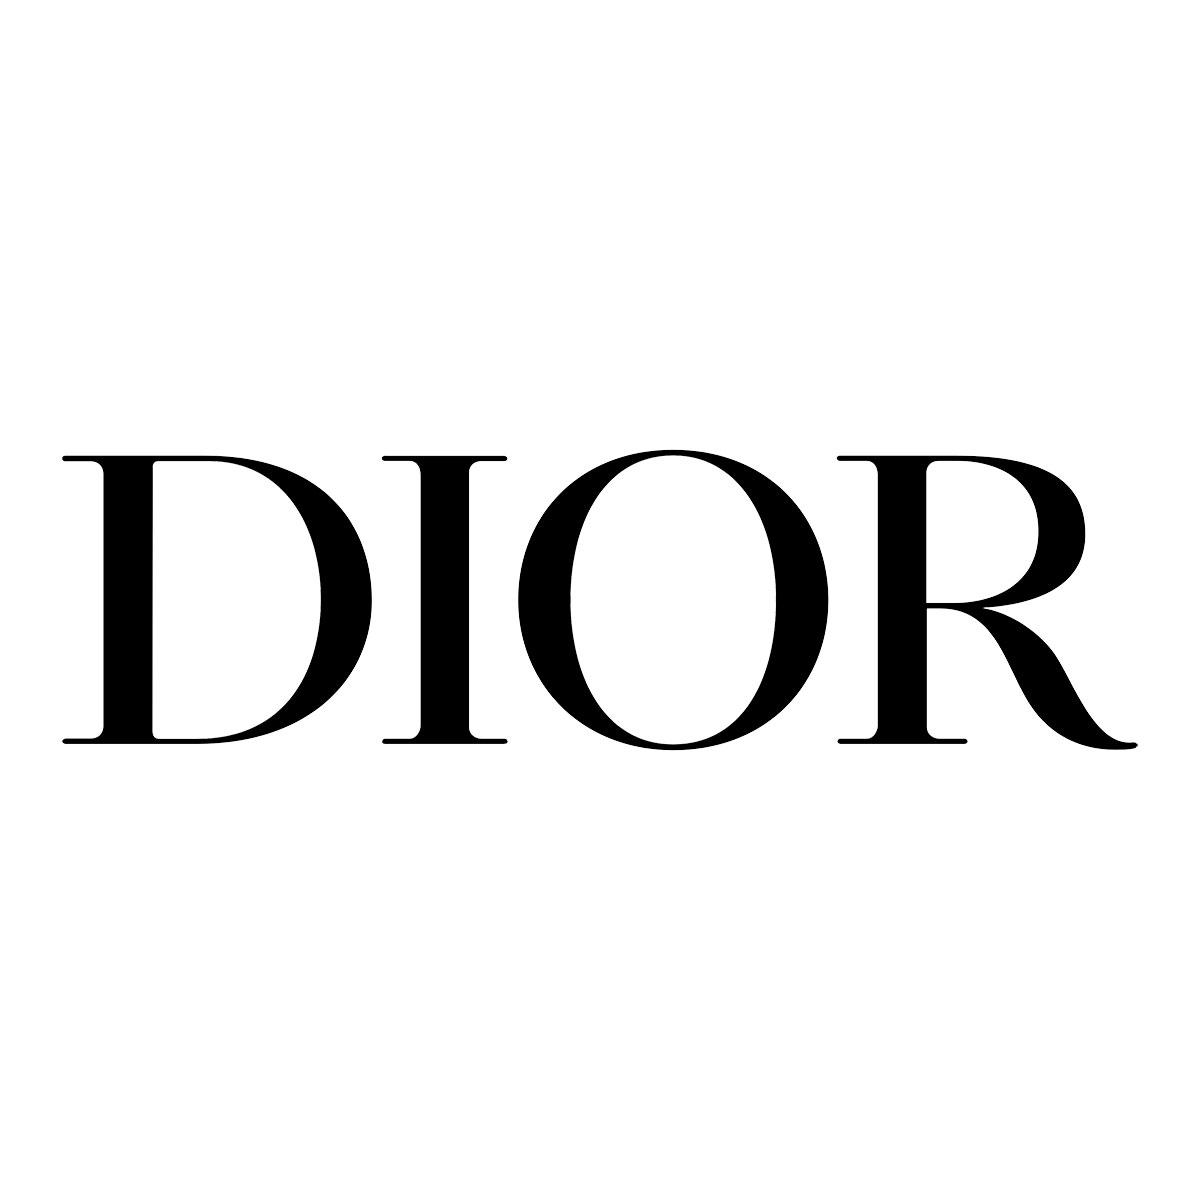 $100 OFF Dior Coupon Code